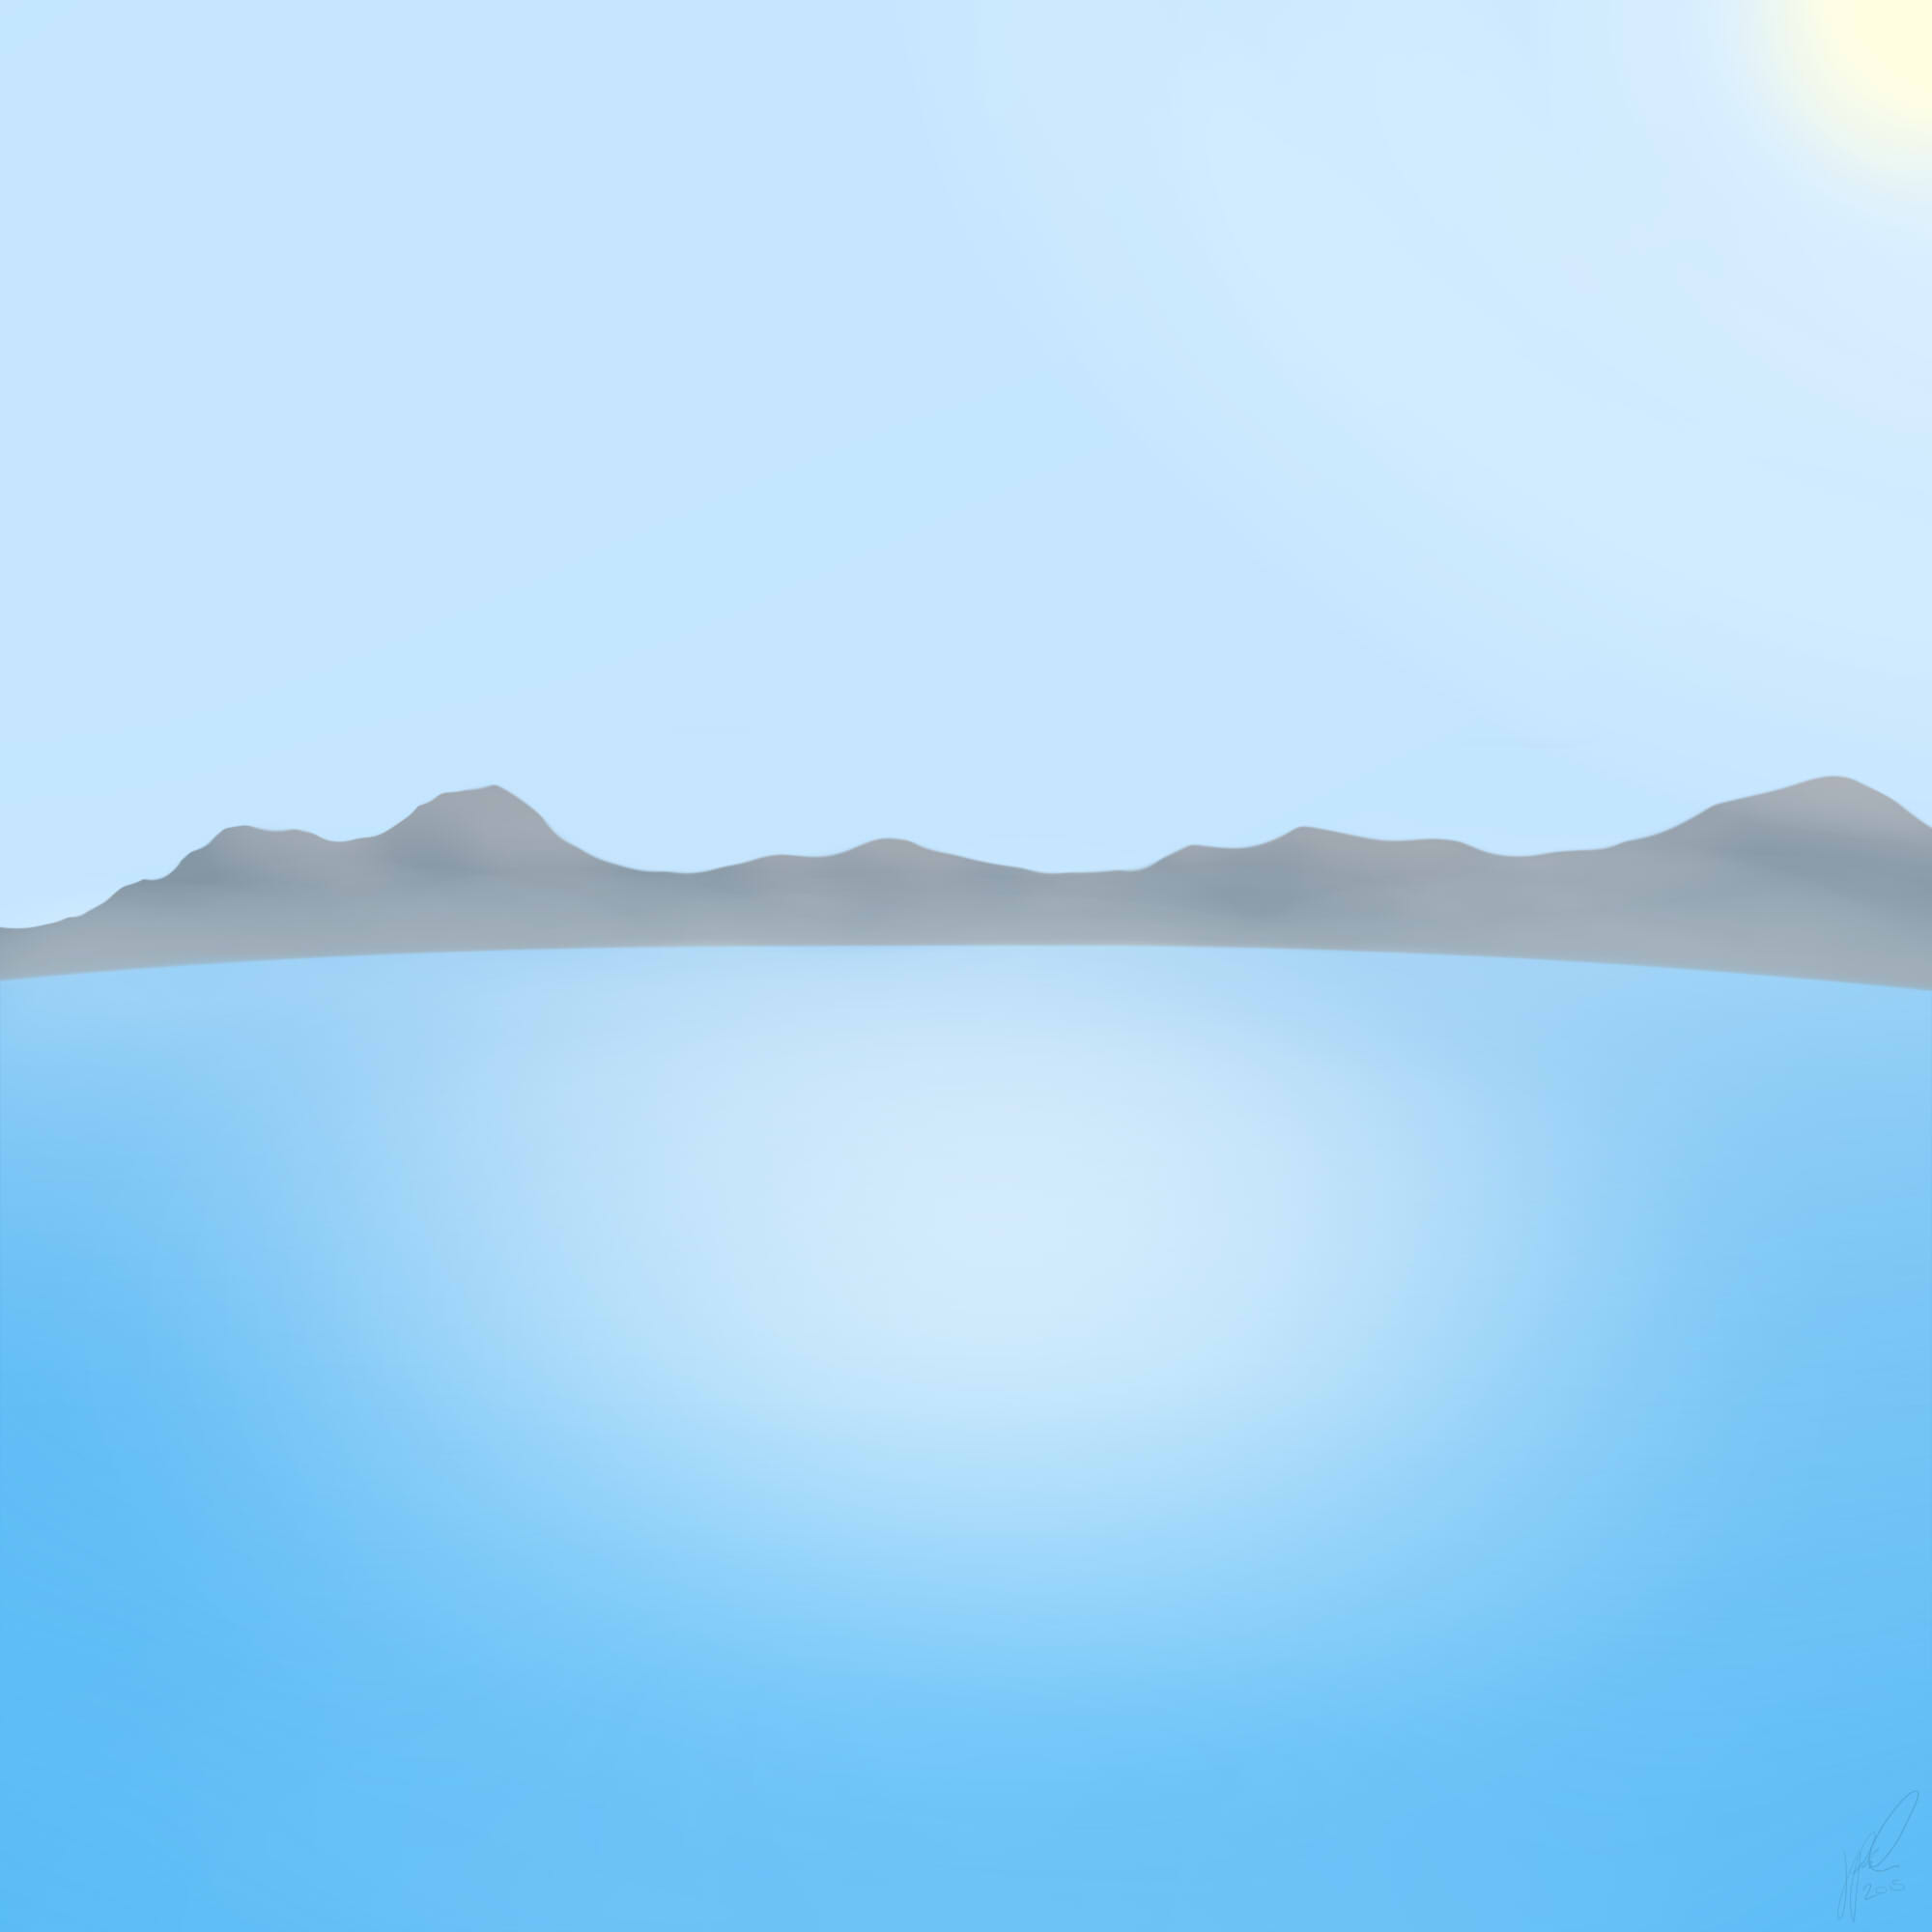 Drawn ocean Drawn Again JordanTheBrony Ocean JordanTheBrony